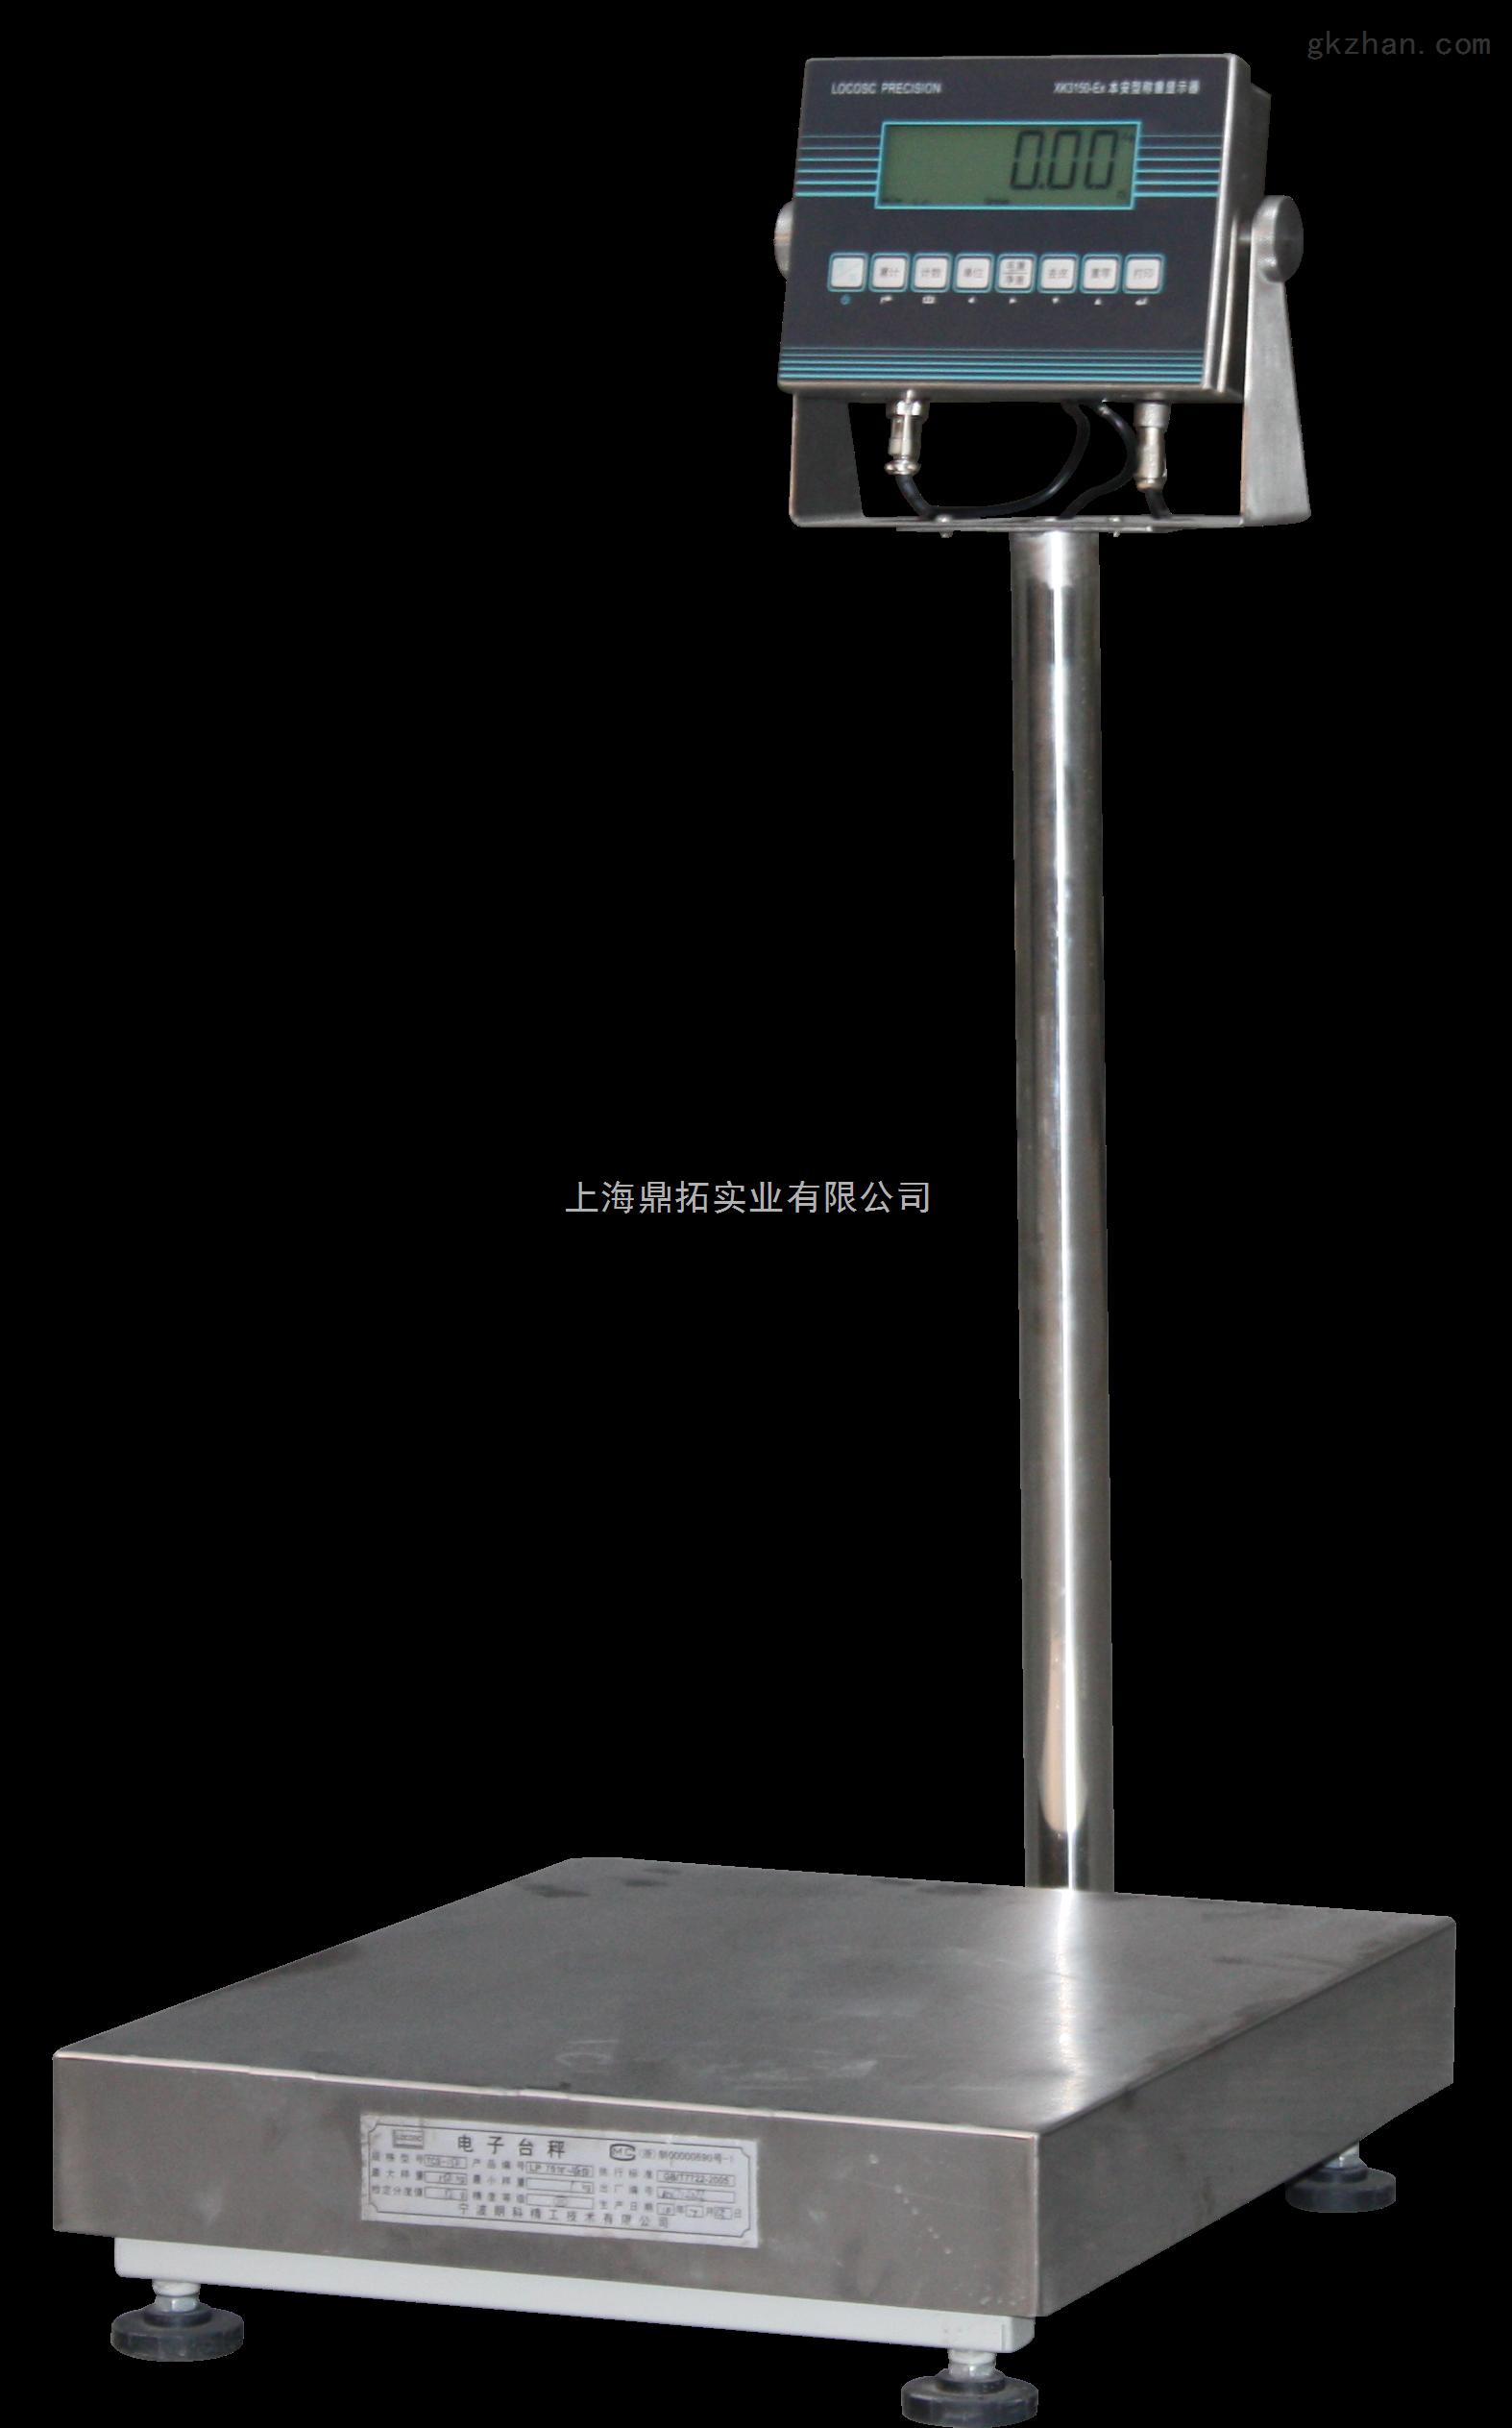 tcs- 数字显示电子秤,青岛工业电子台秤